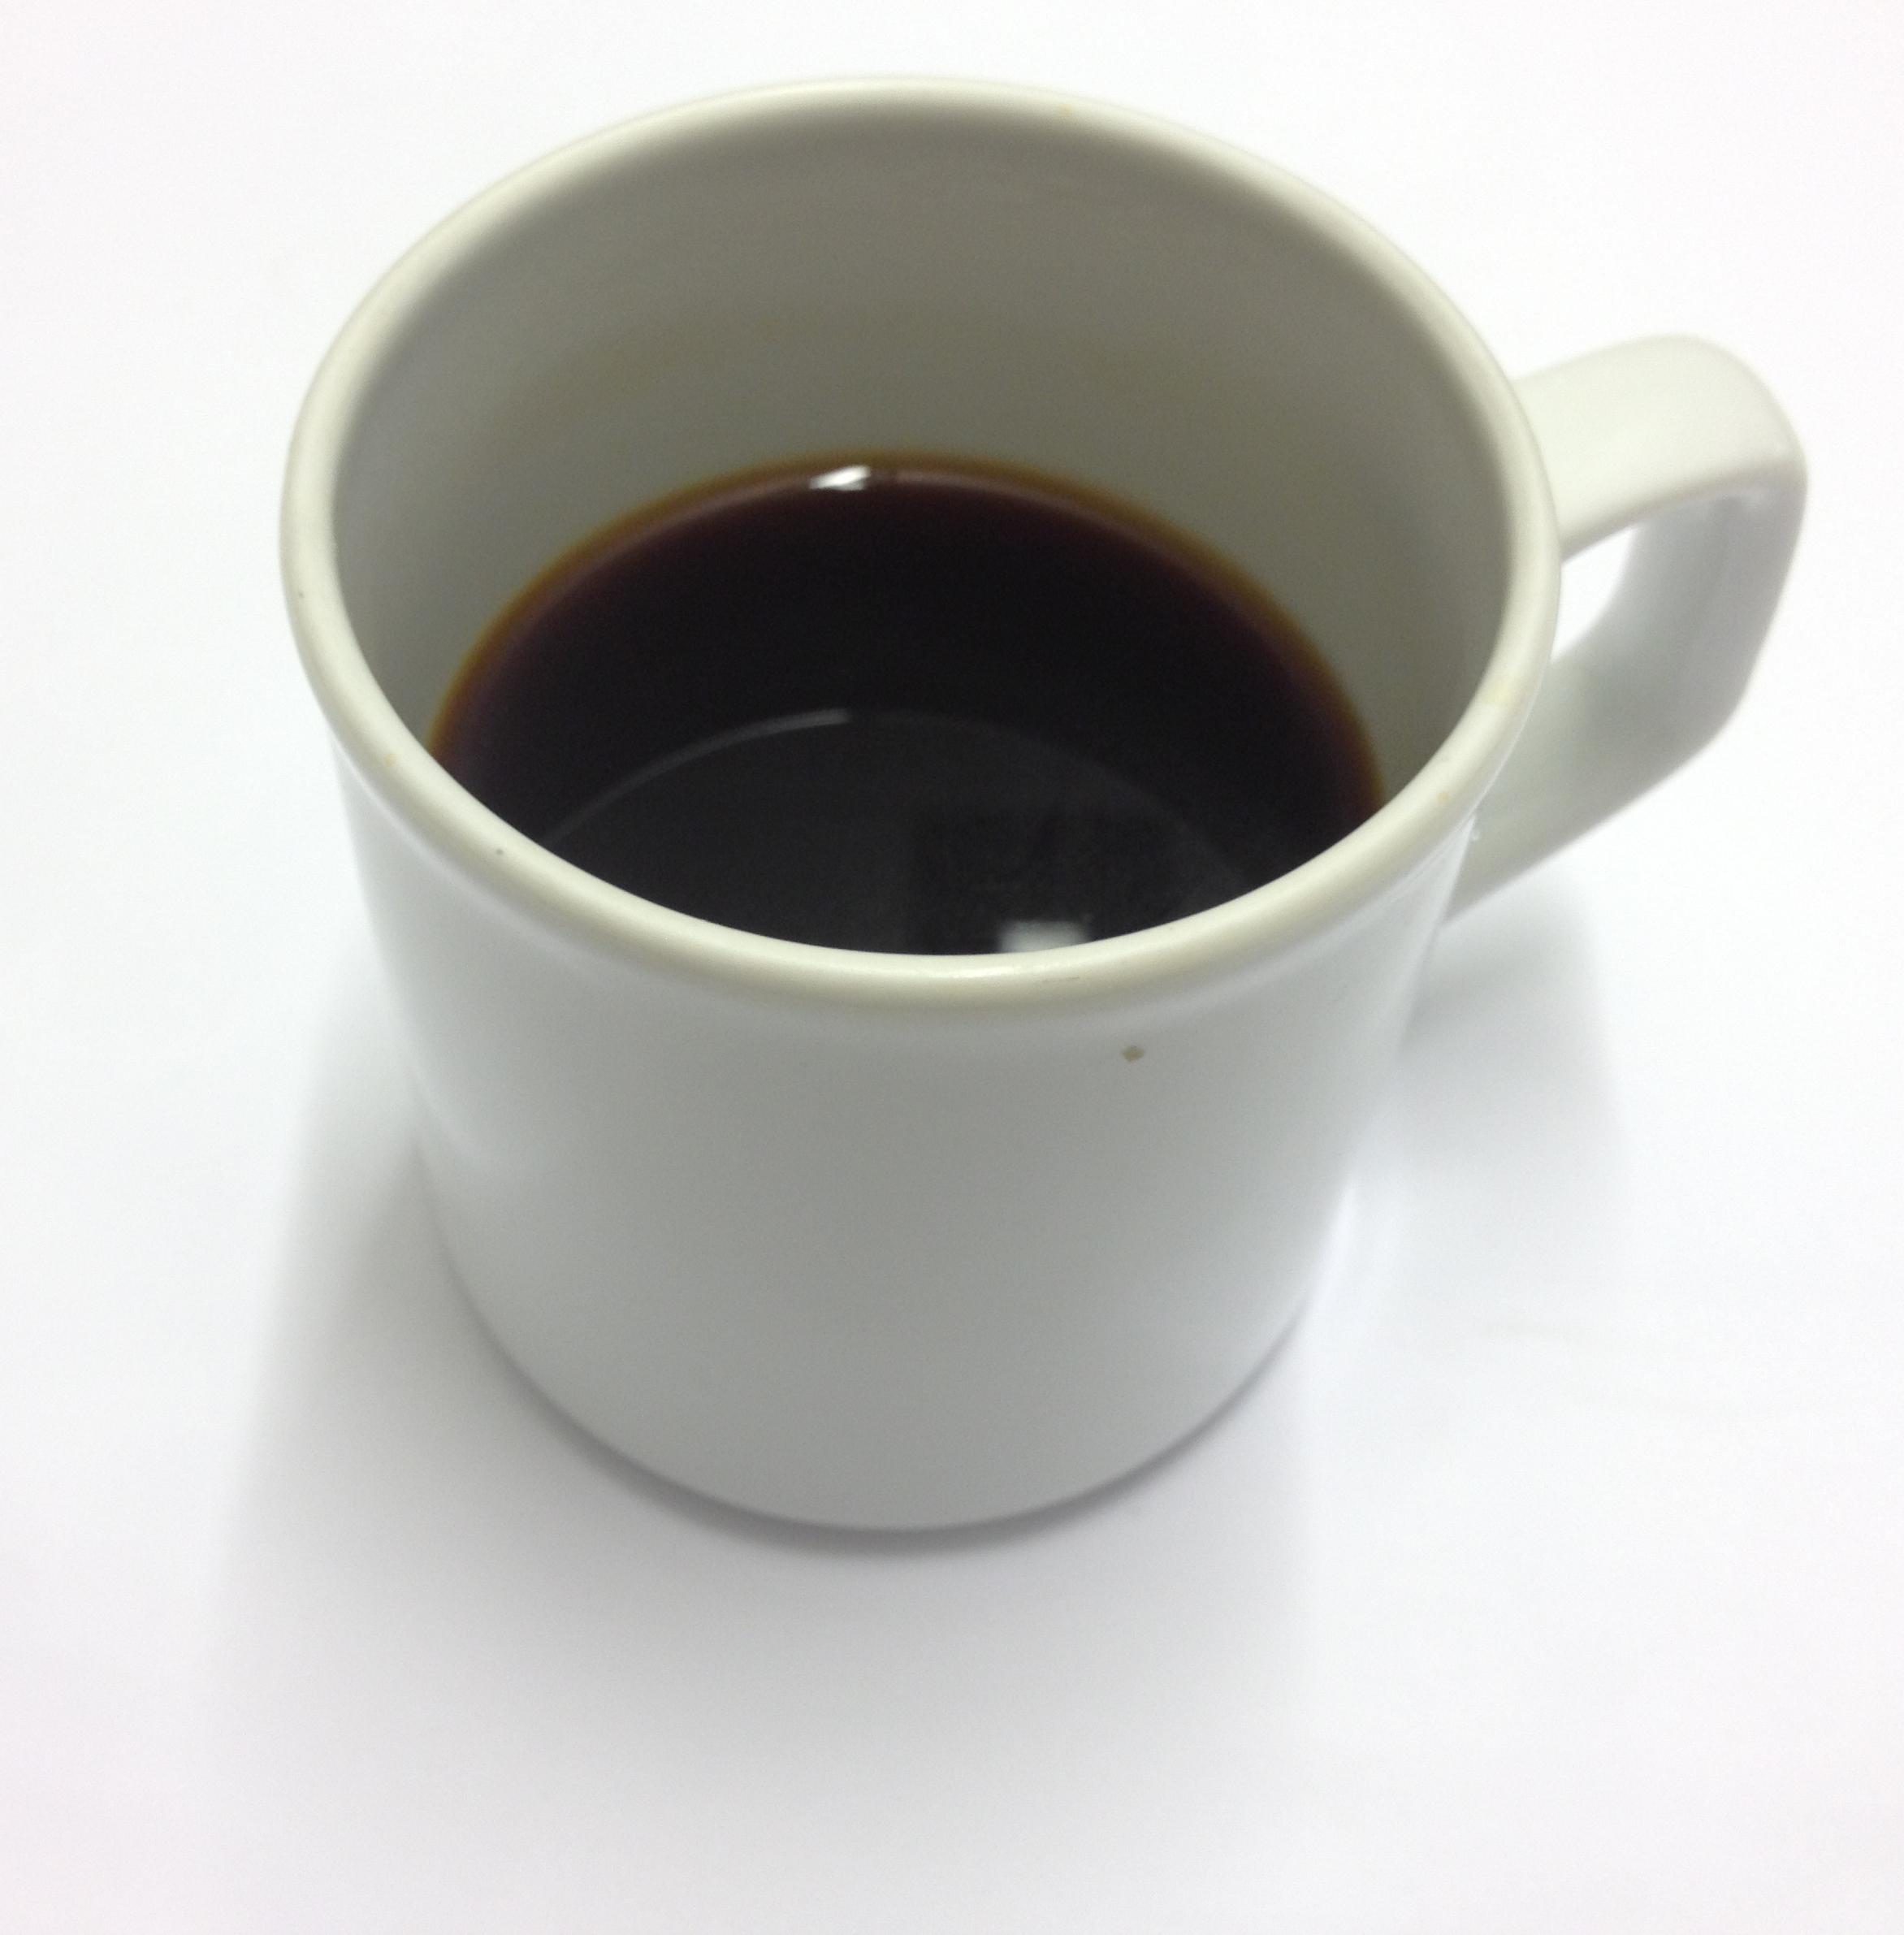 File:White cup of black coffee.jpg